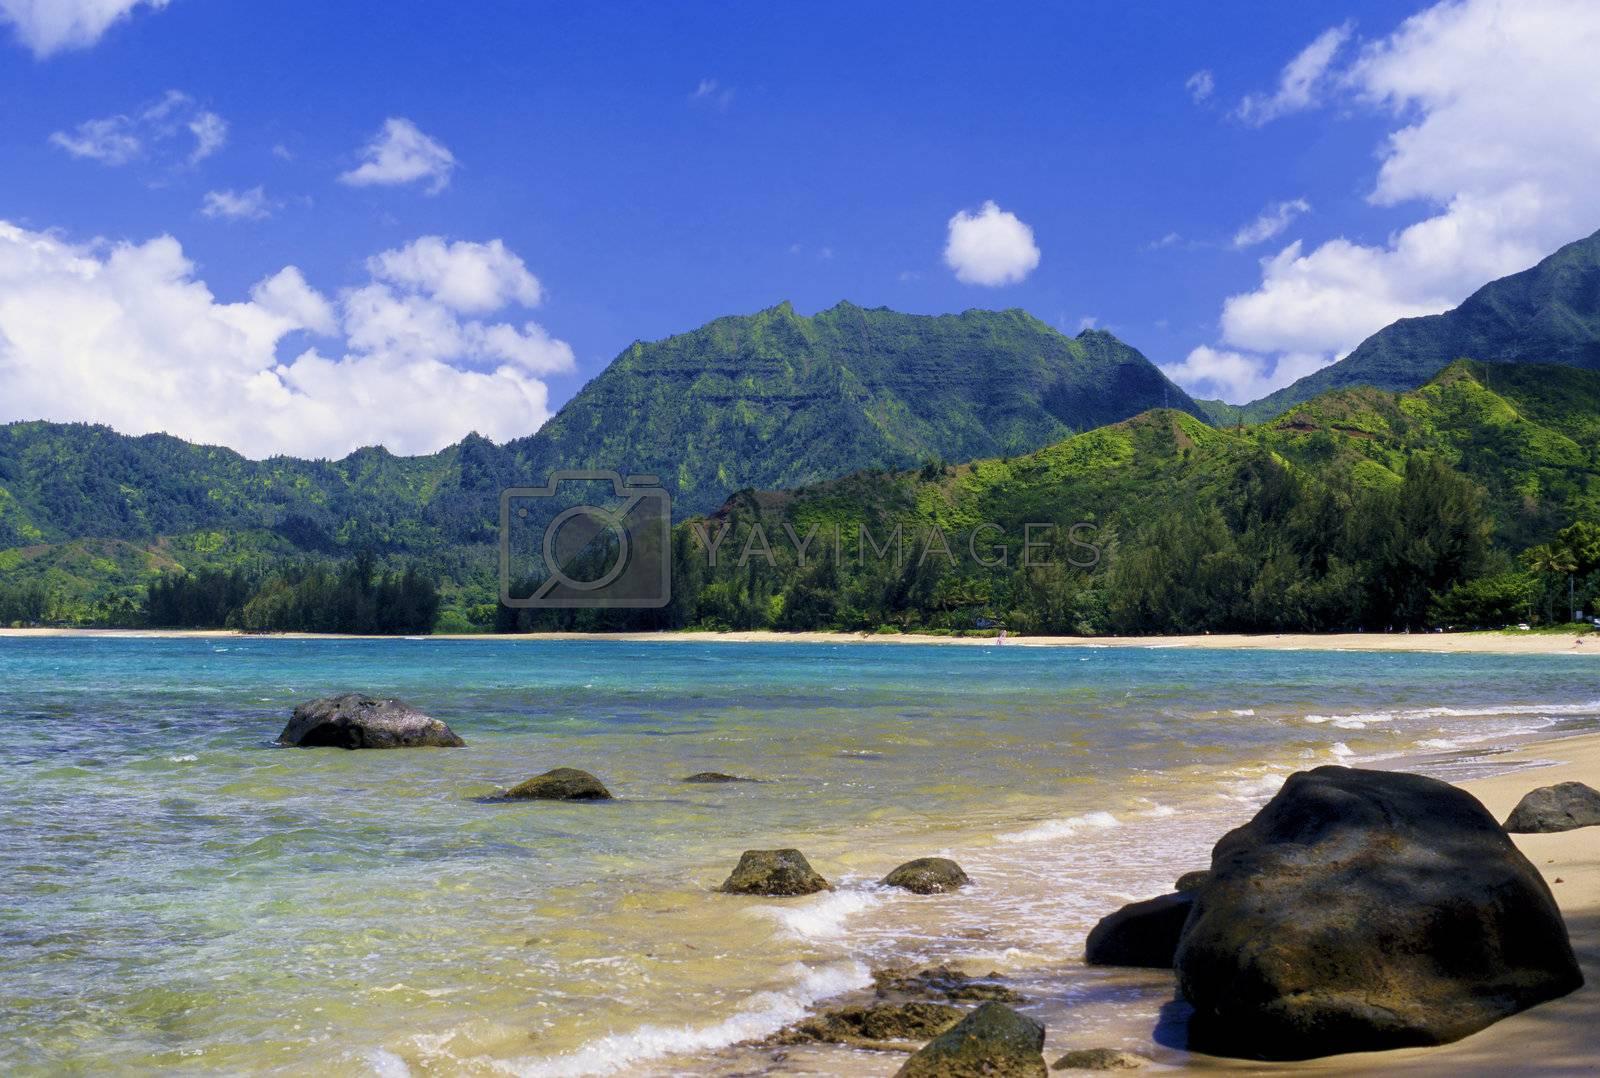 Beautiful Hanalei Bay is located on the scenic north shore of Kauai, Hawaii.